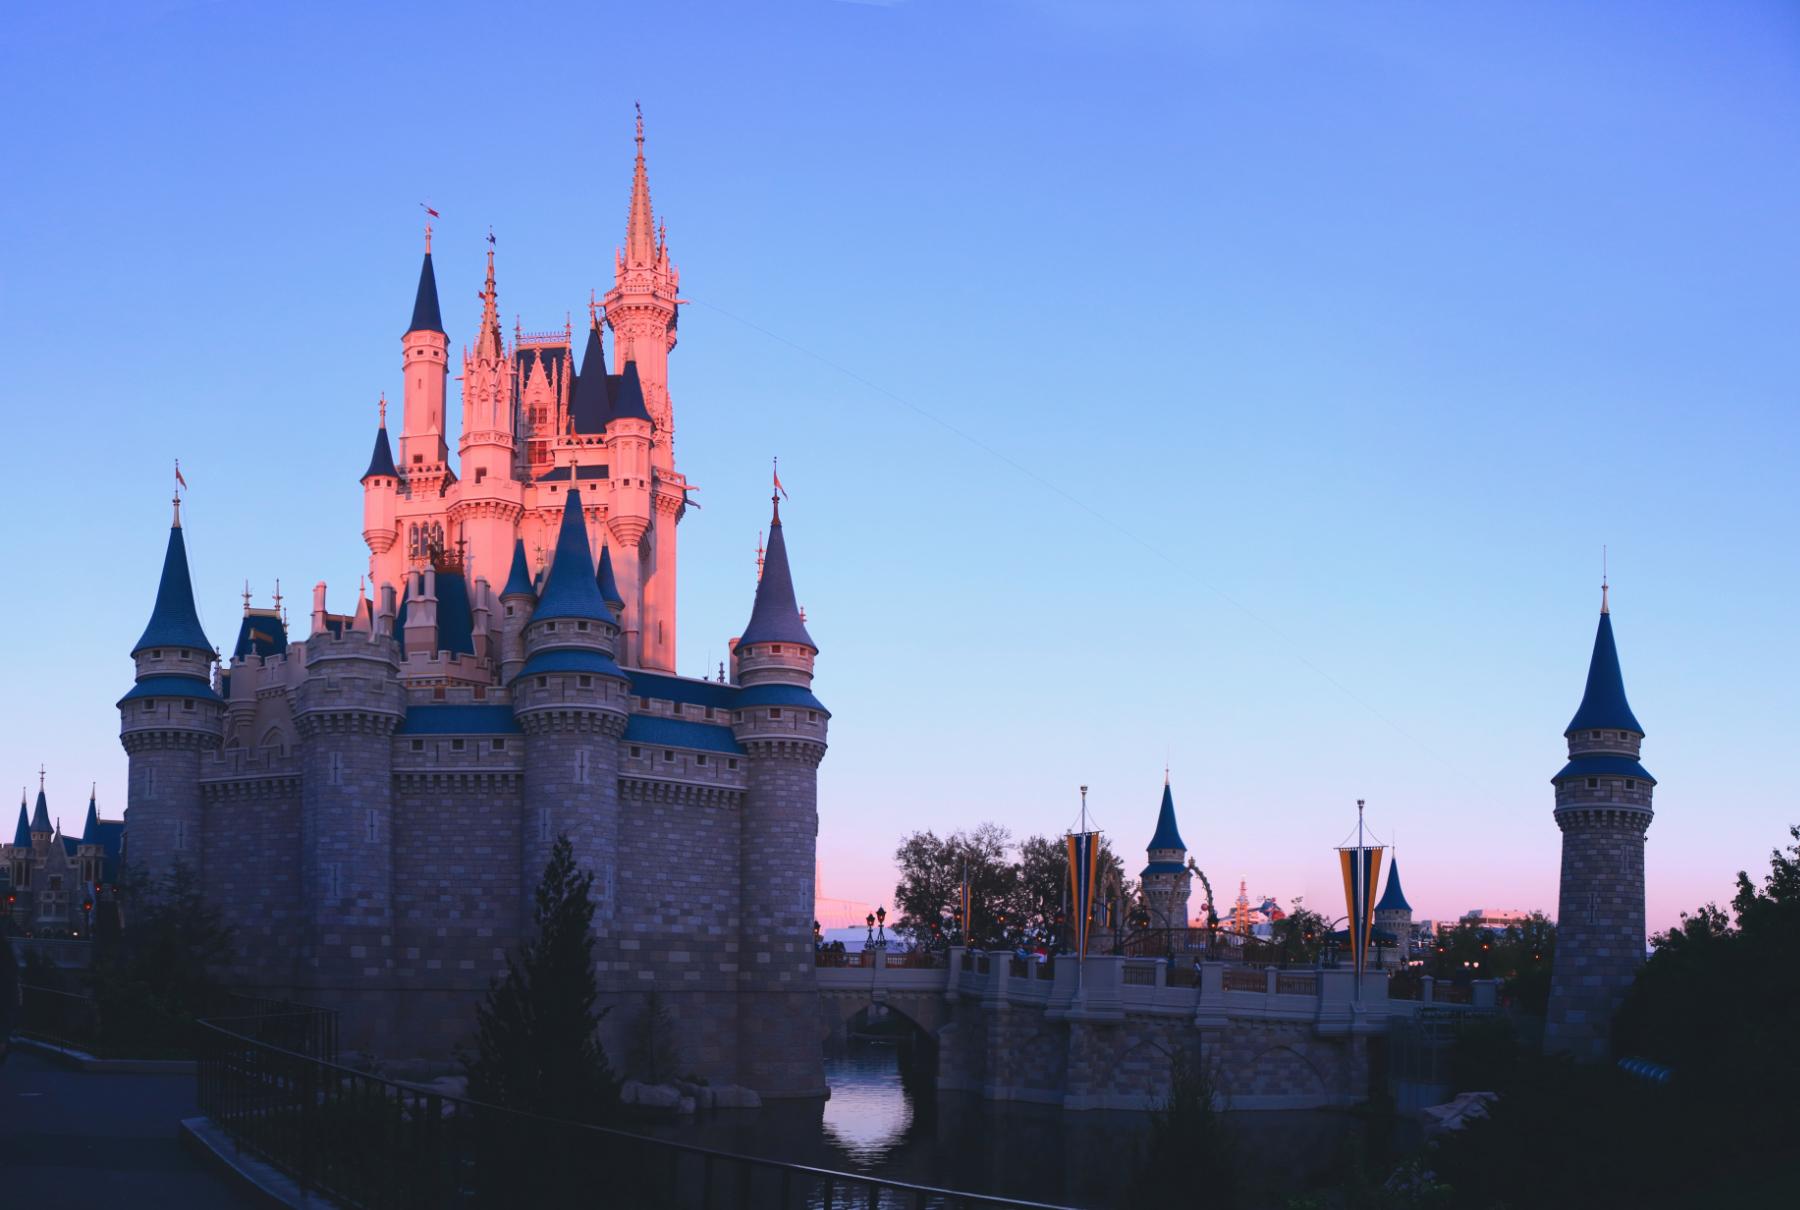 castlefinal_web.jpg